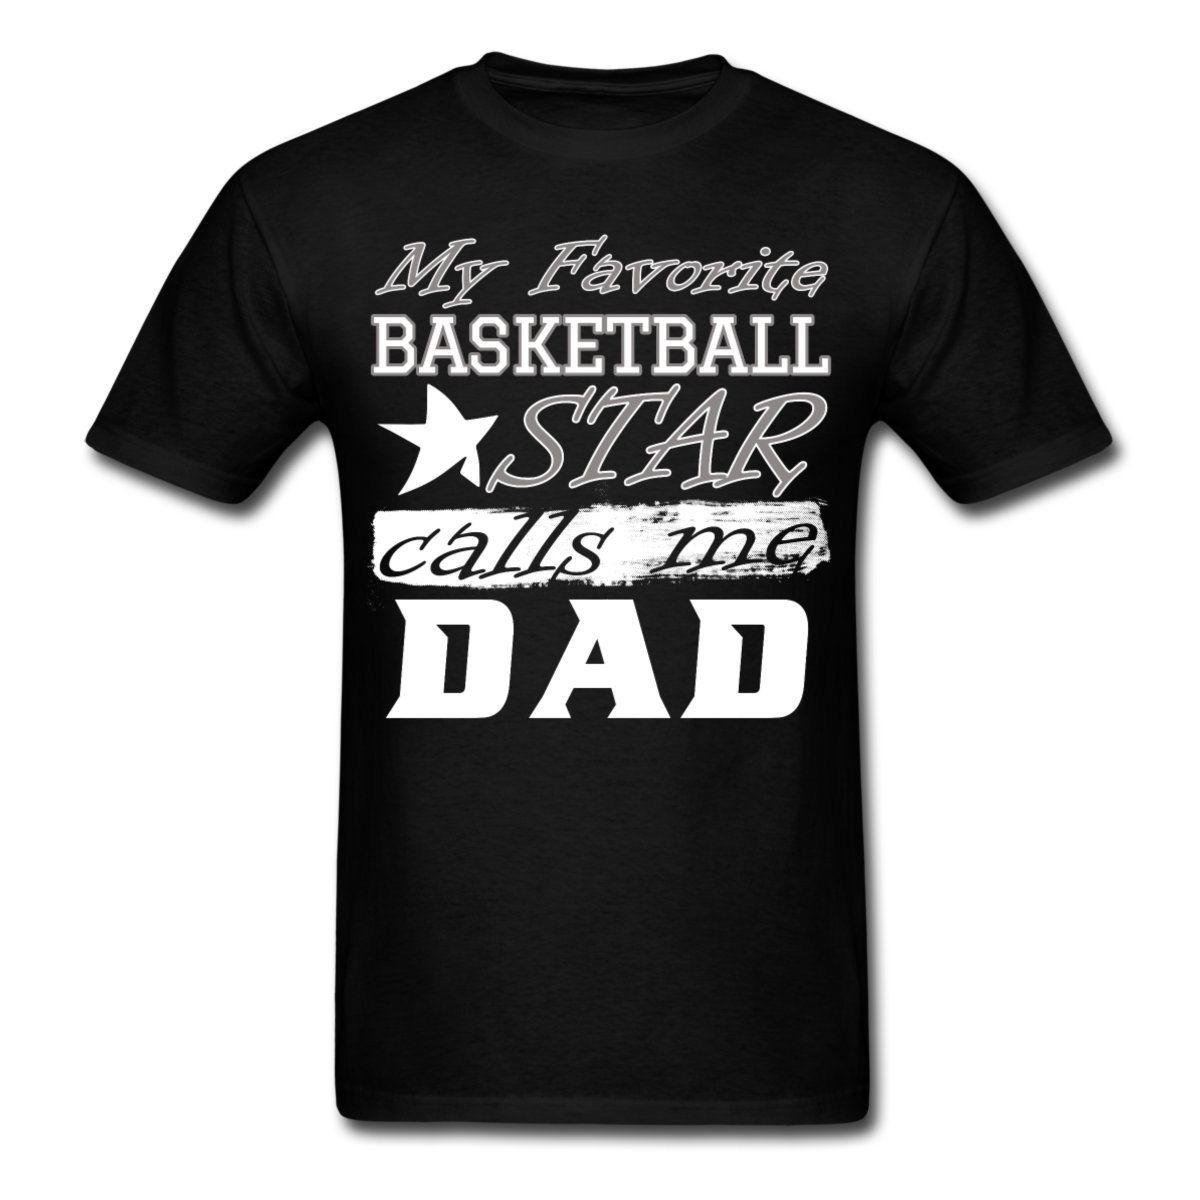 Basketballer Star Dad Men's T-Shirt Teenage Natural Cotton Printed Funny Clothing Casual Short Sleeve T Shirts